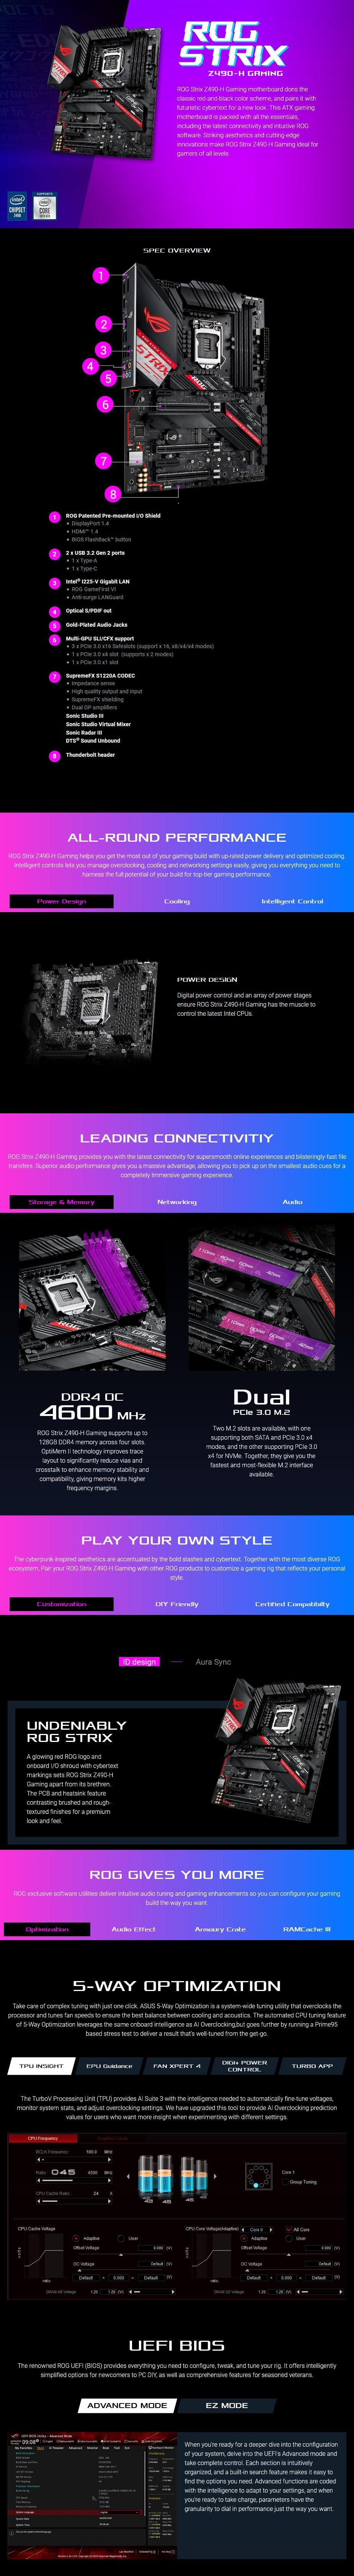 asus-rog-strix-z490h-gaming-lga-1200-motherboard-ac34479-9.jpg